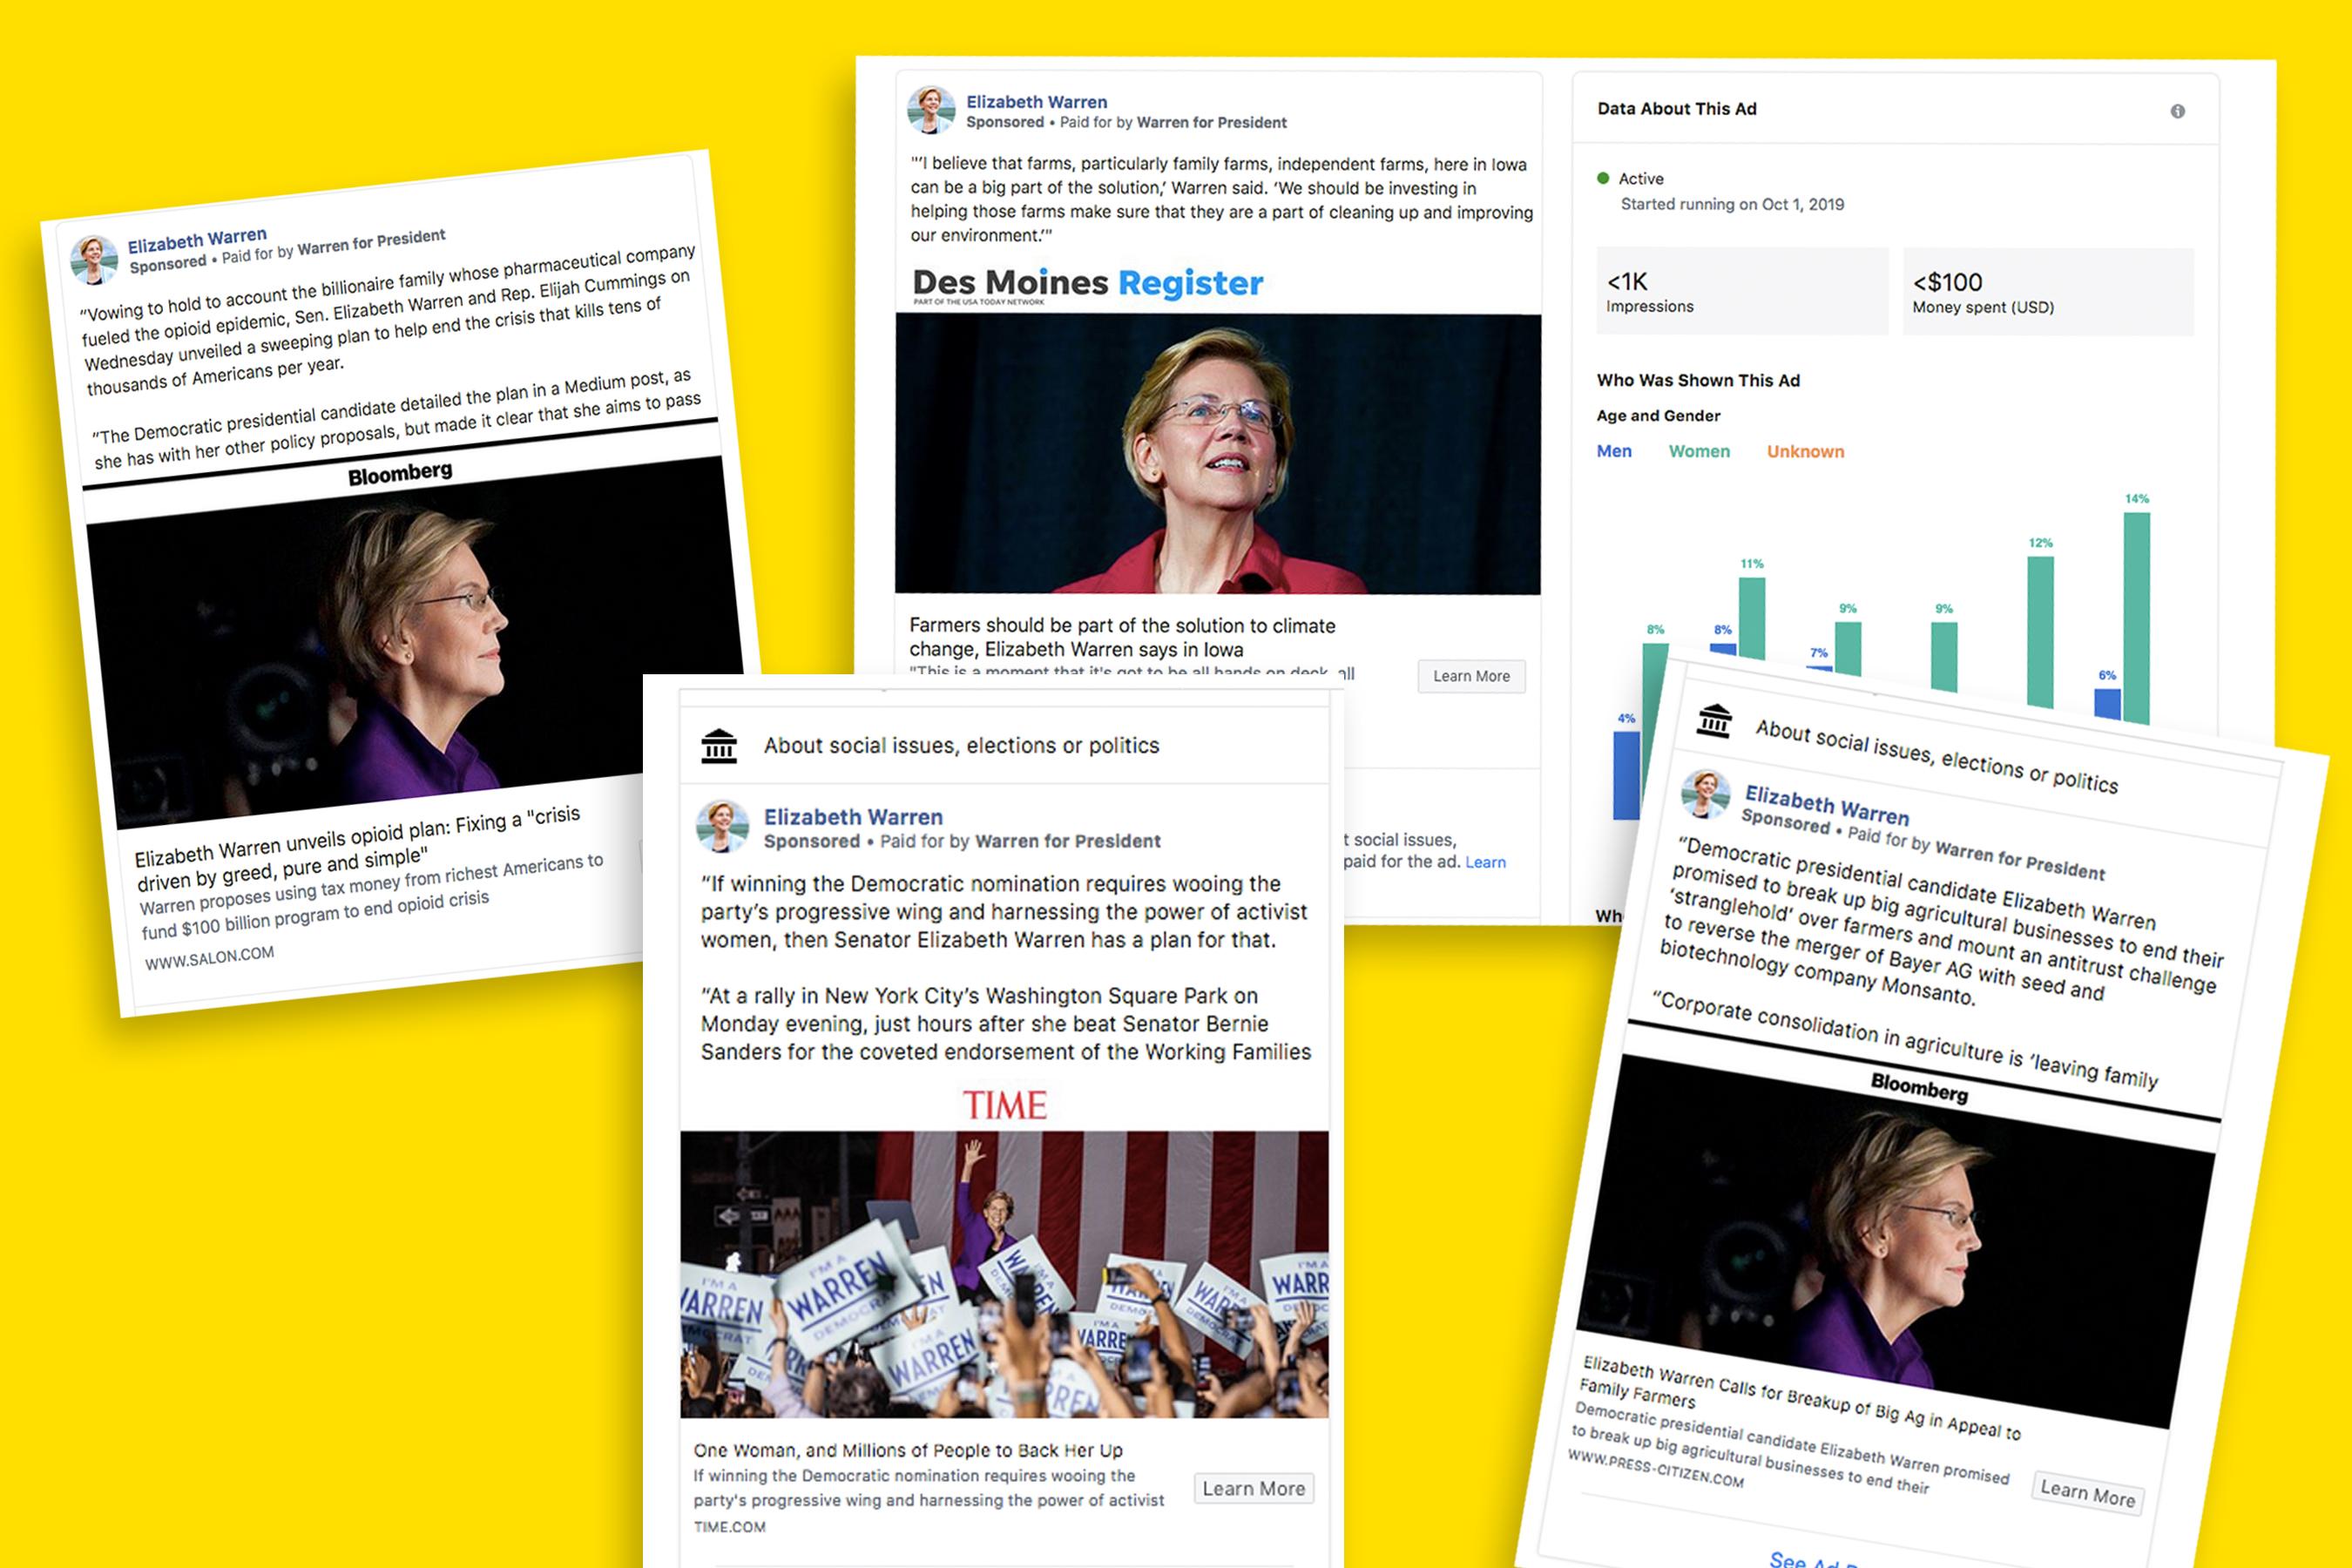 Elizabeth Warren's Facebook ads turn news coverage into political messages